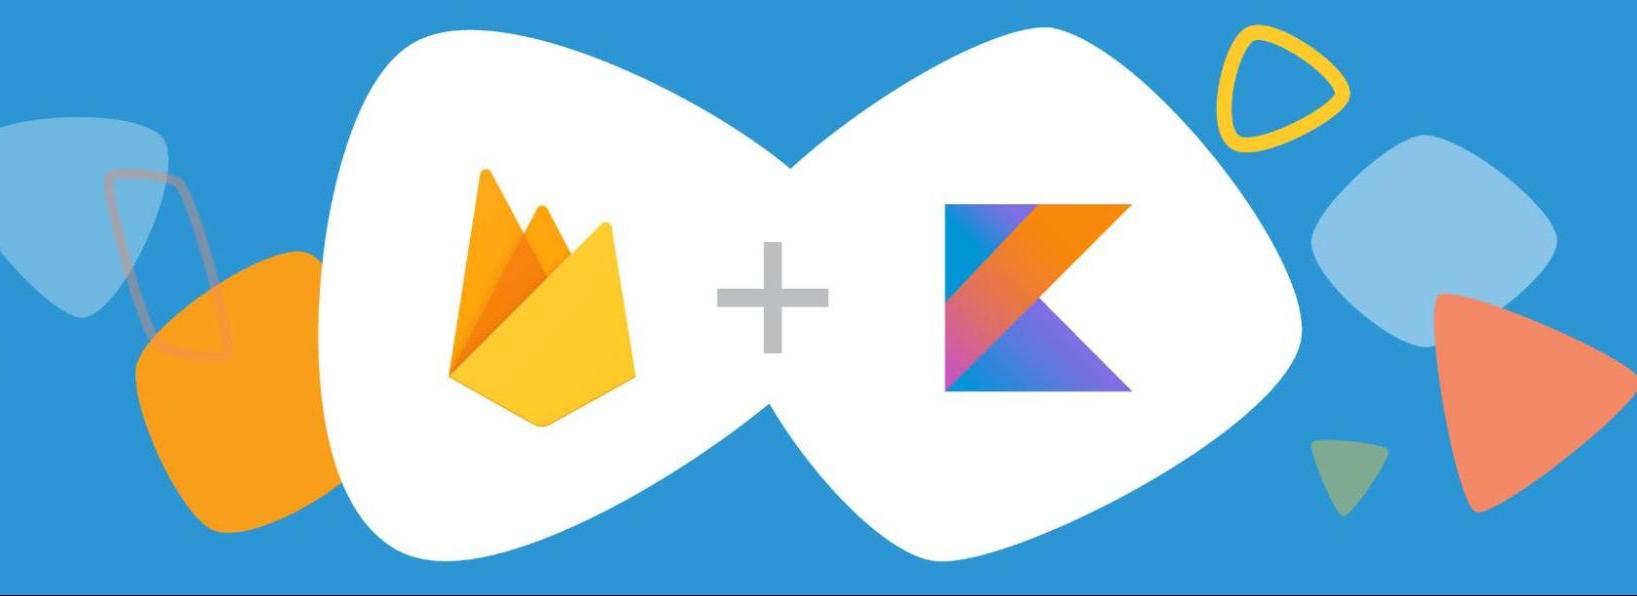 Firebase & Kotlin logo